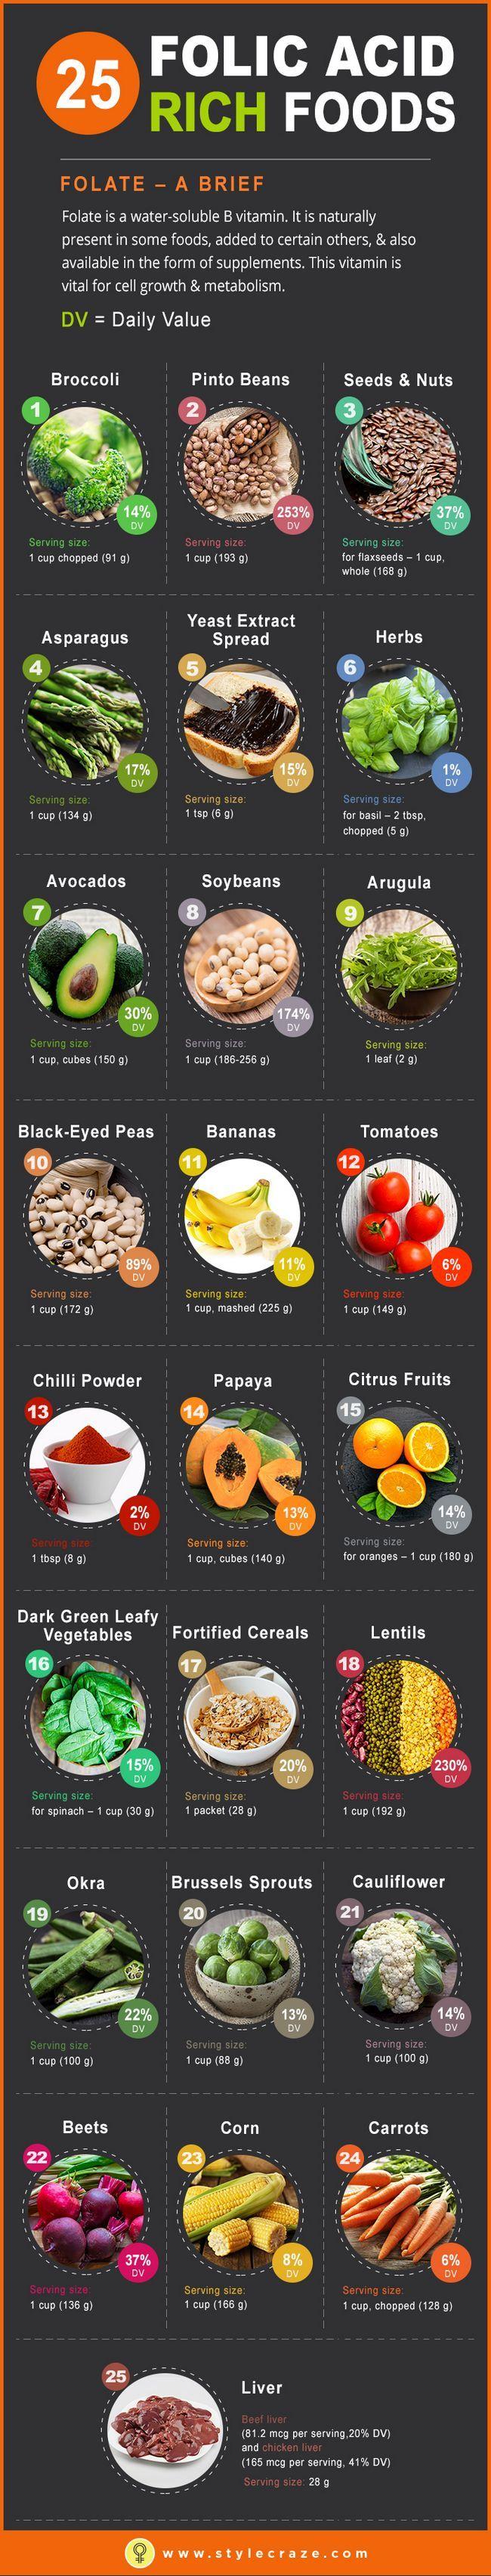 Top 25 livsmedel rika på folsyra